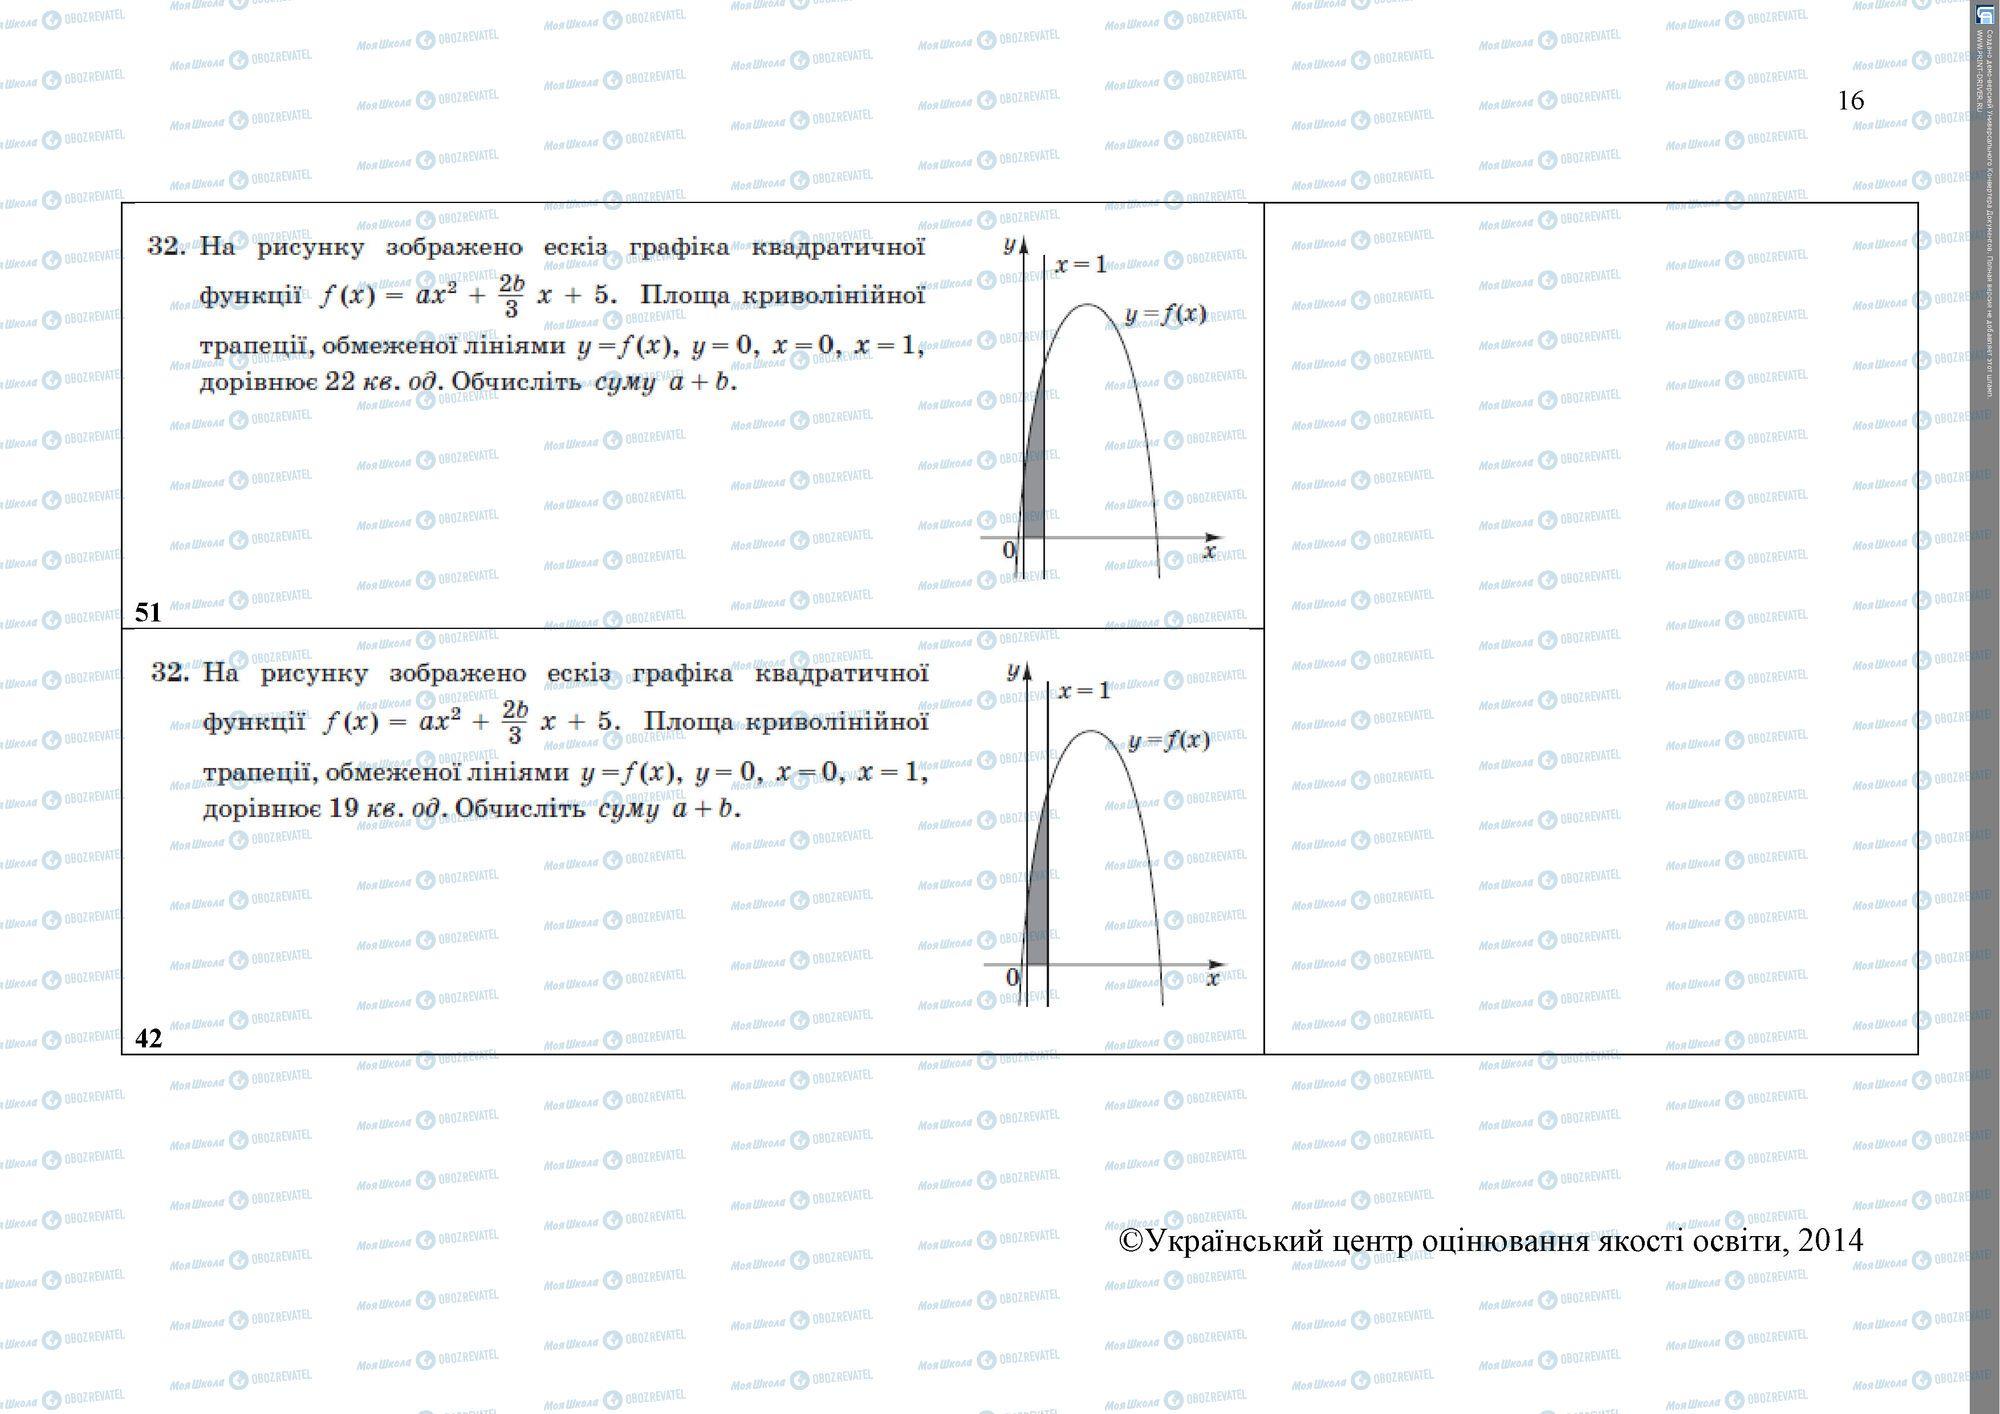 ЗНО Математика 11 класс страница 16